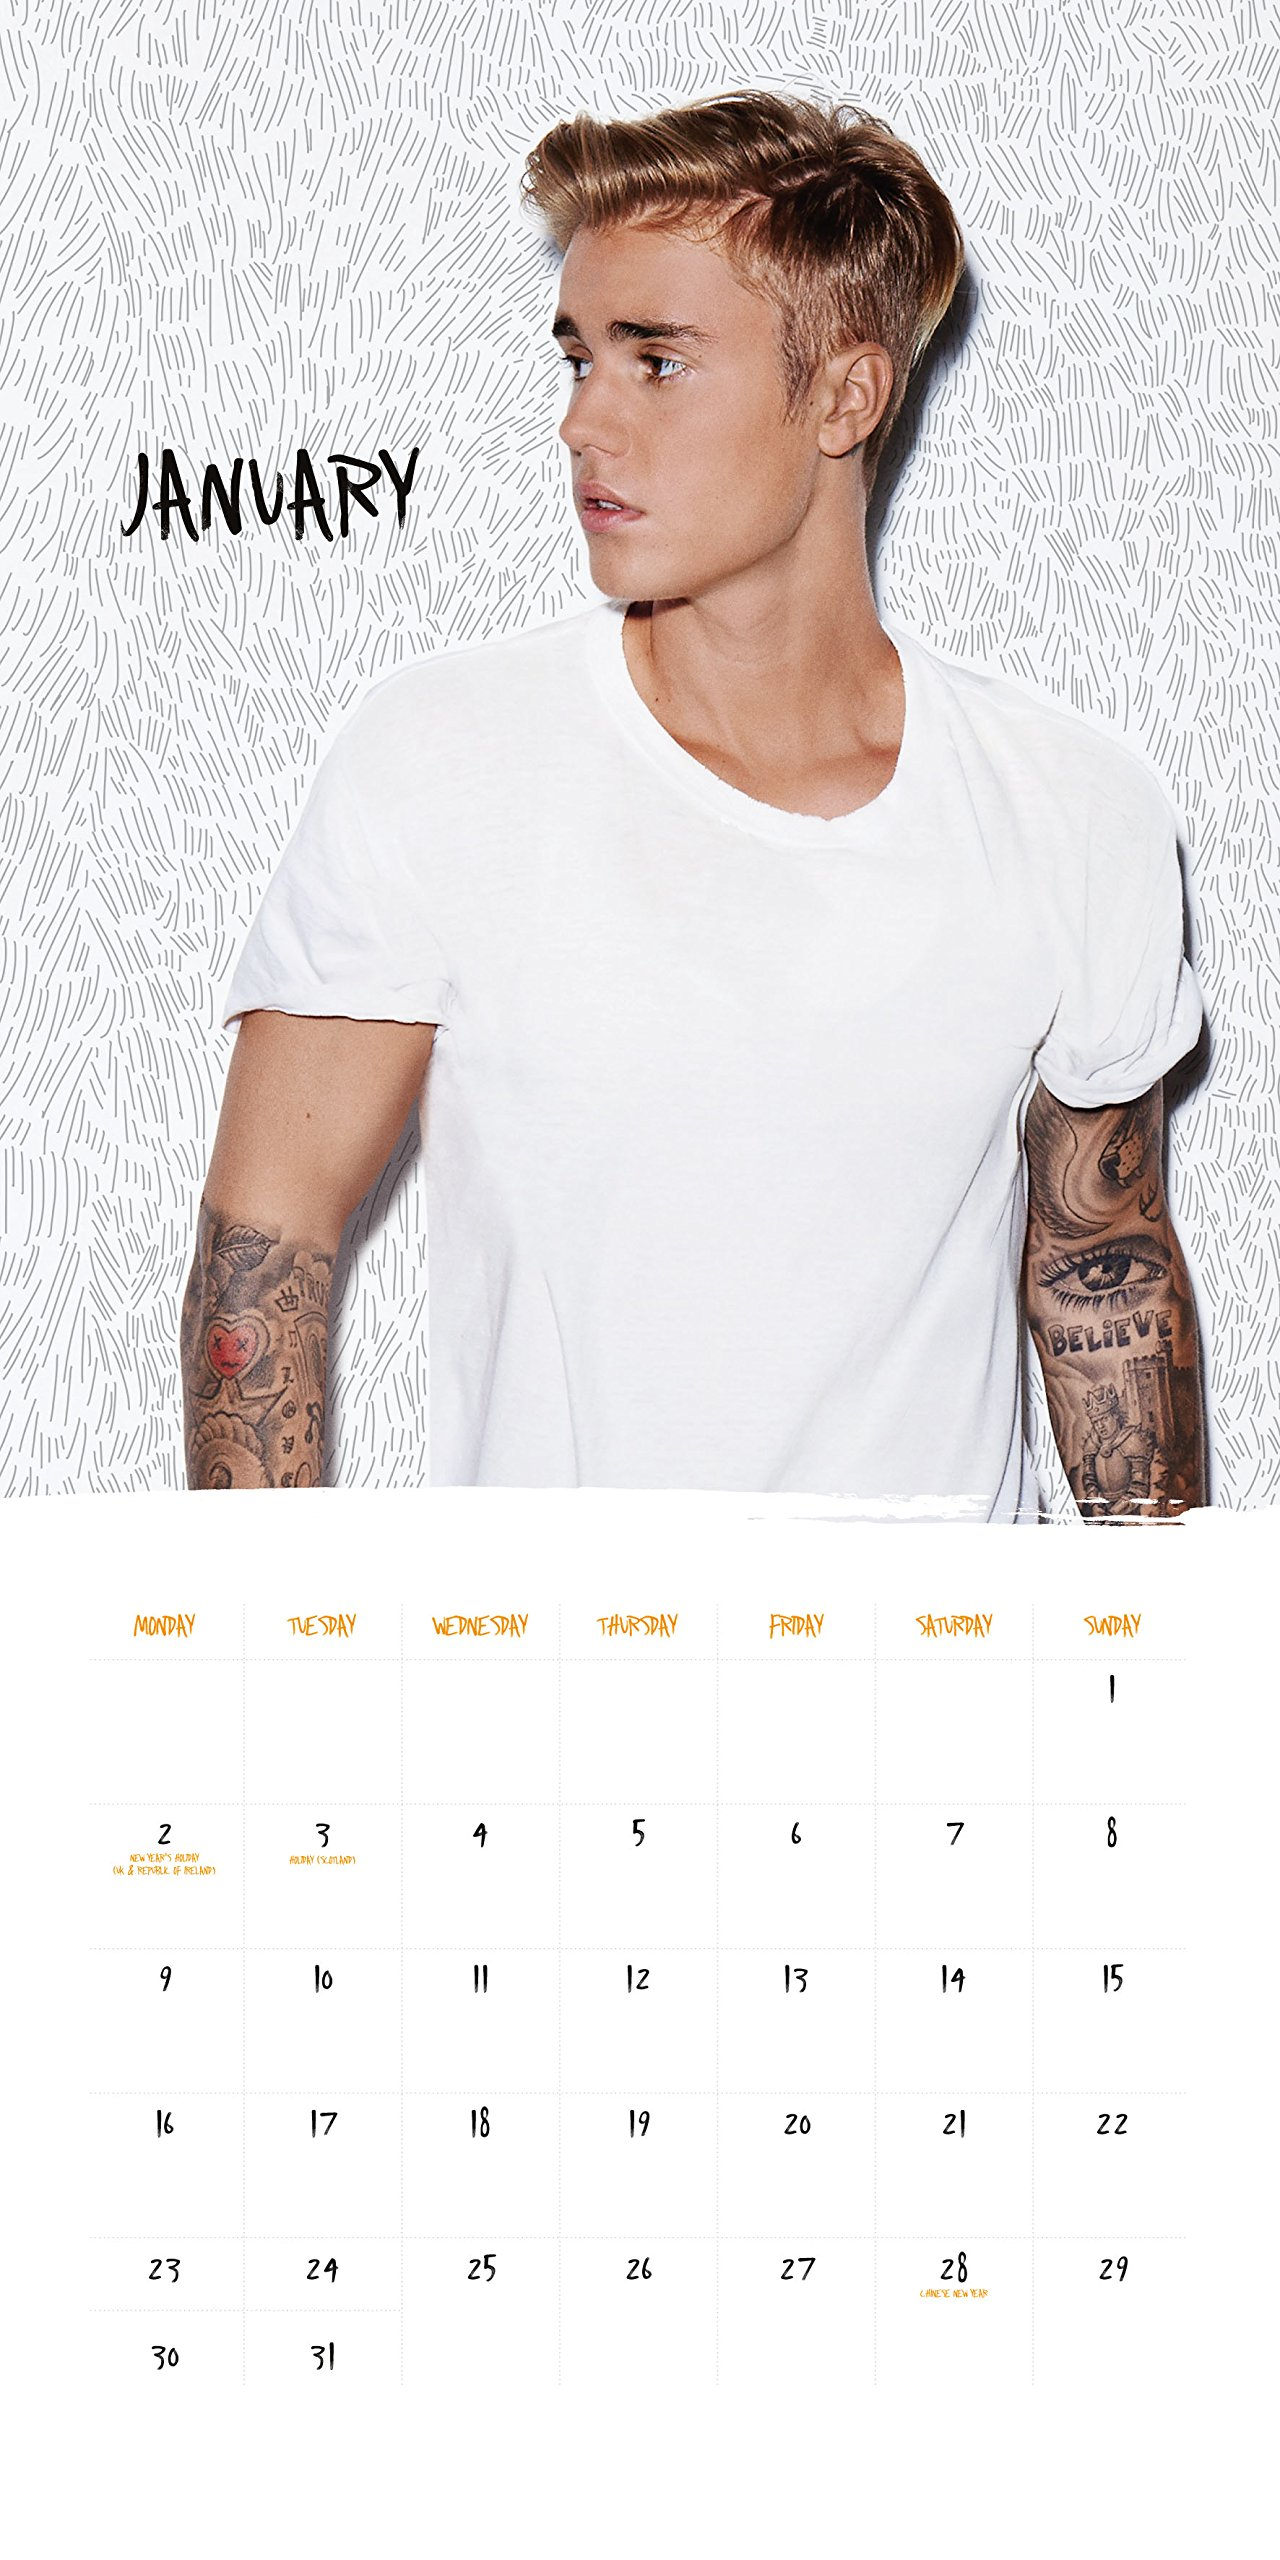 How is justin bieber dating 2019 calendar